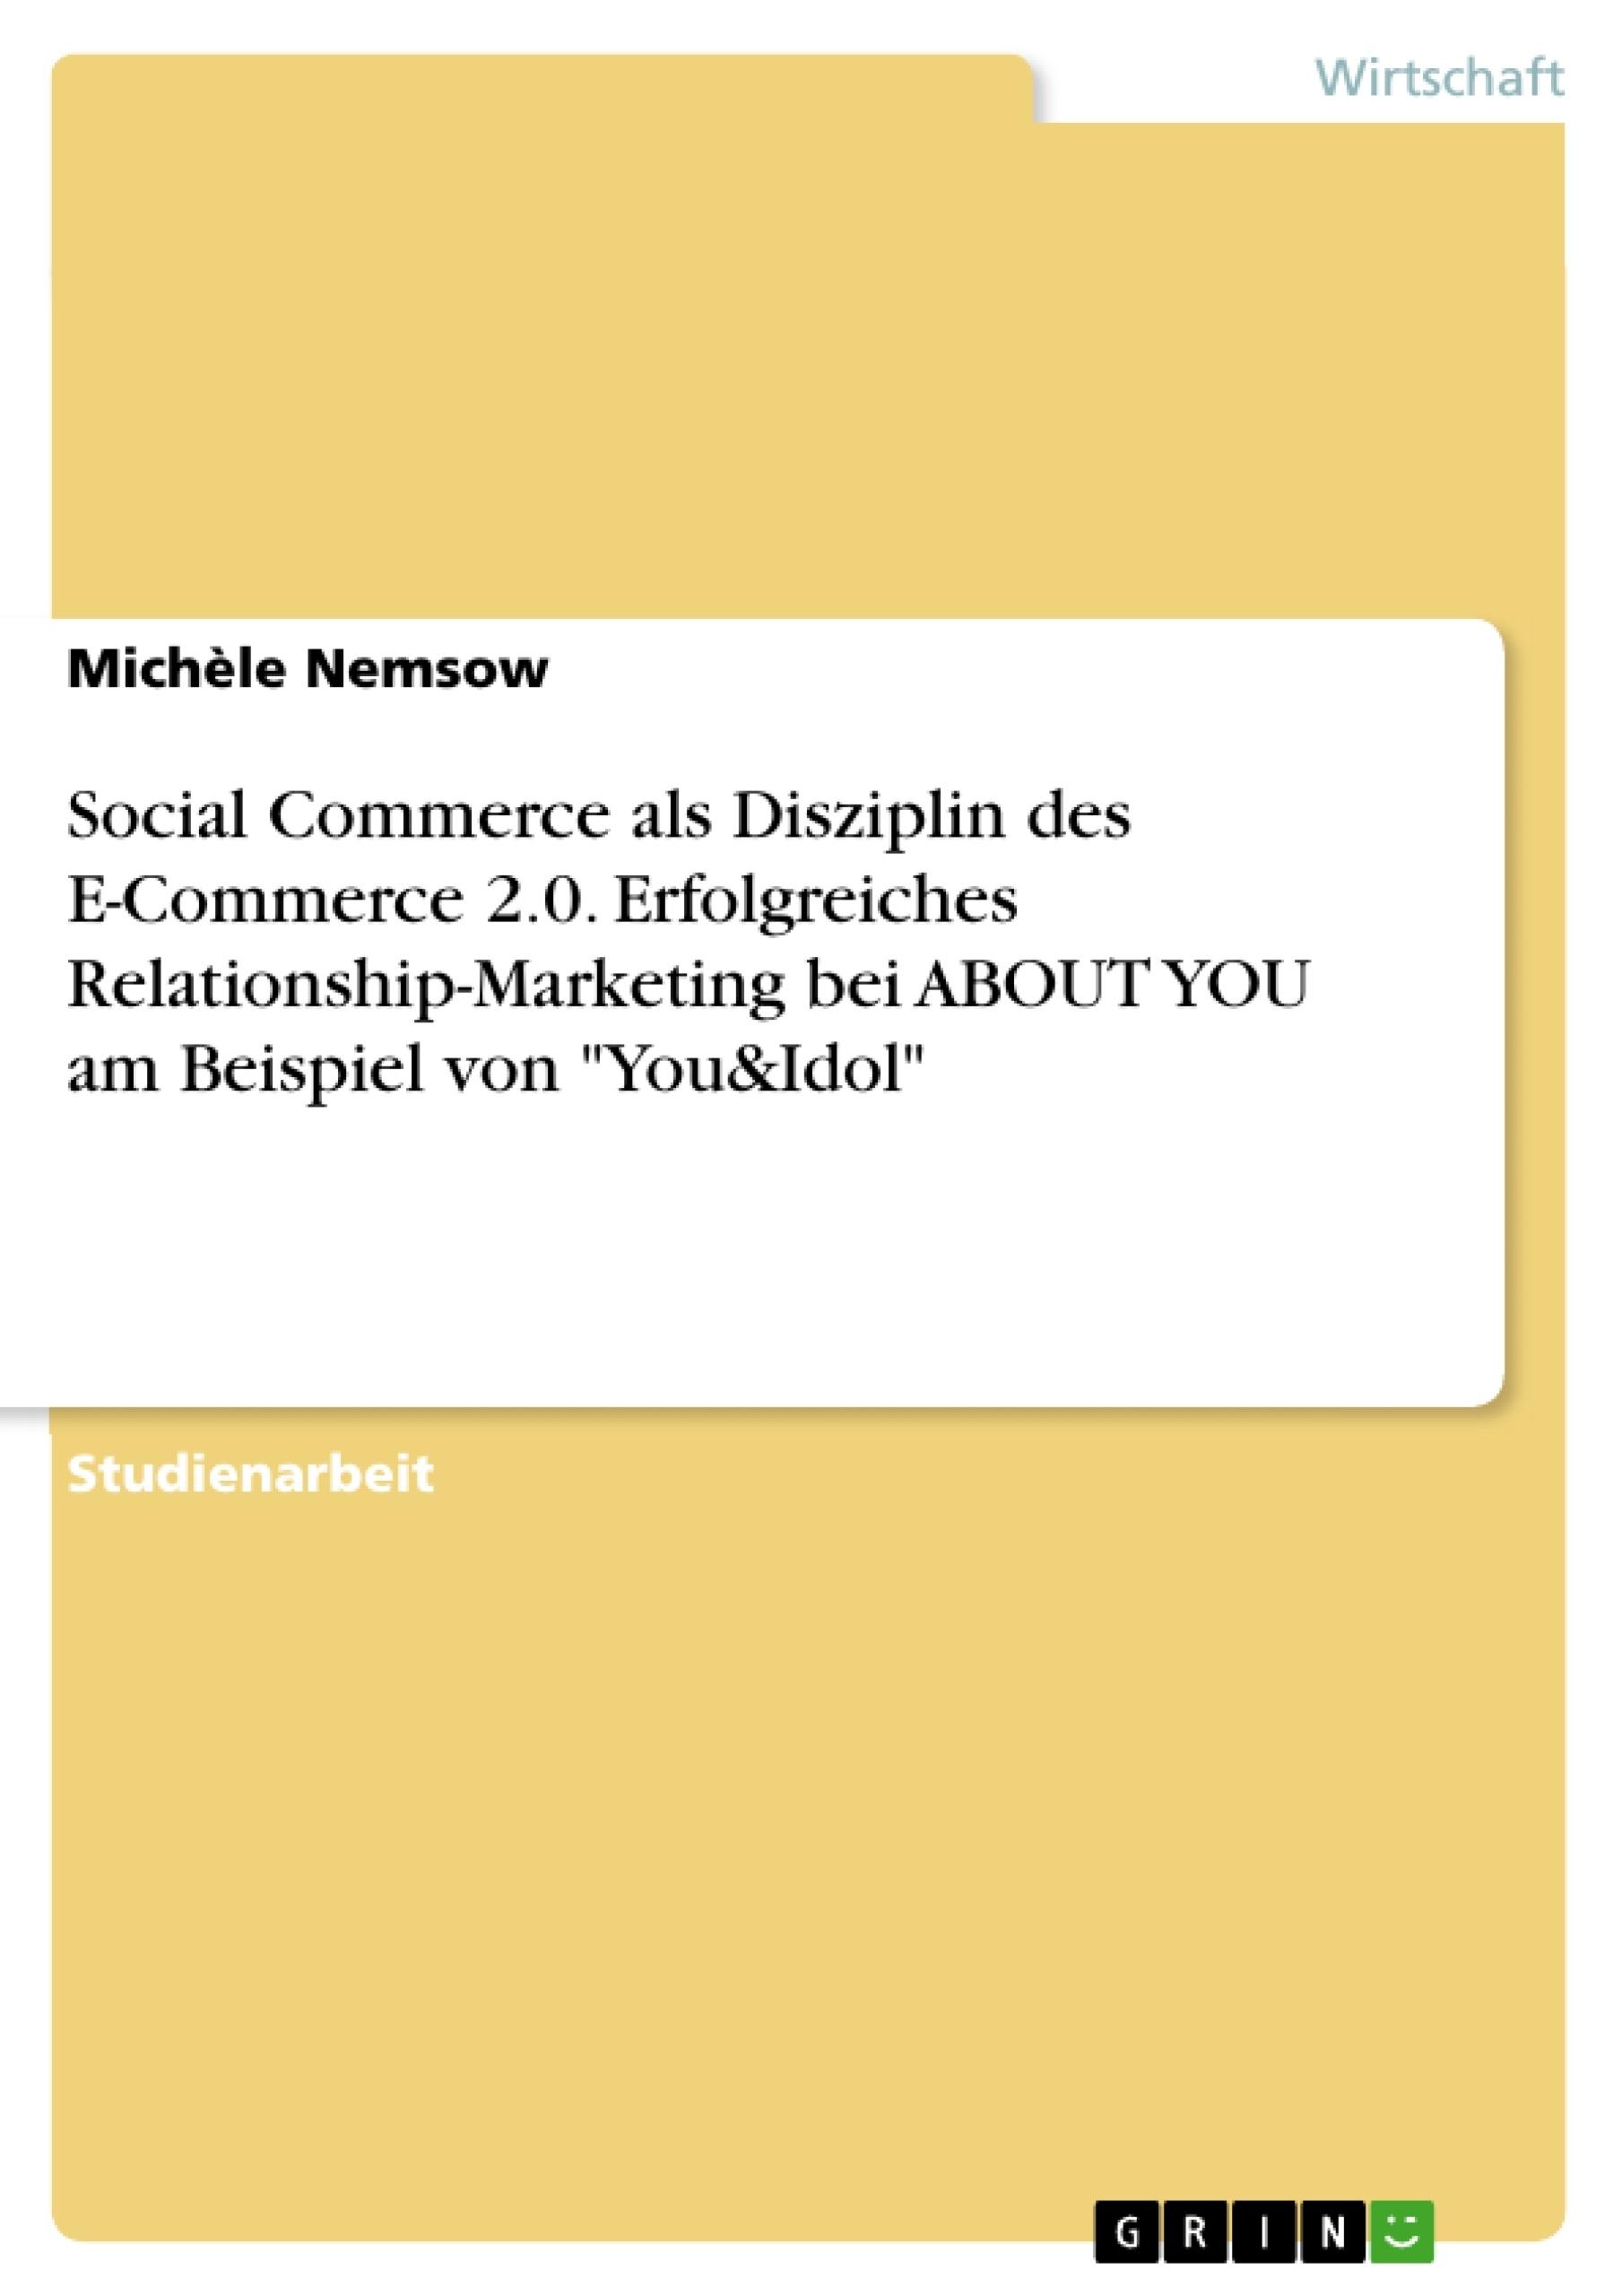 "Titel: Social Commerce als Disziplin des E-Commerce 2.0. Erfolgreiches Relationship-Marketing bei ABOUT YOU am Beispiel von ""You&Idol"""